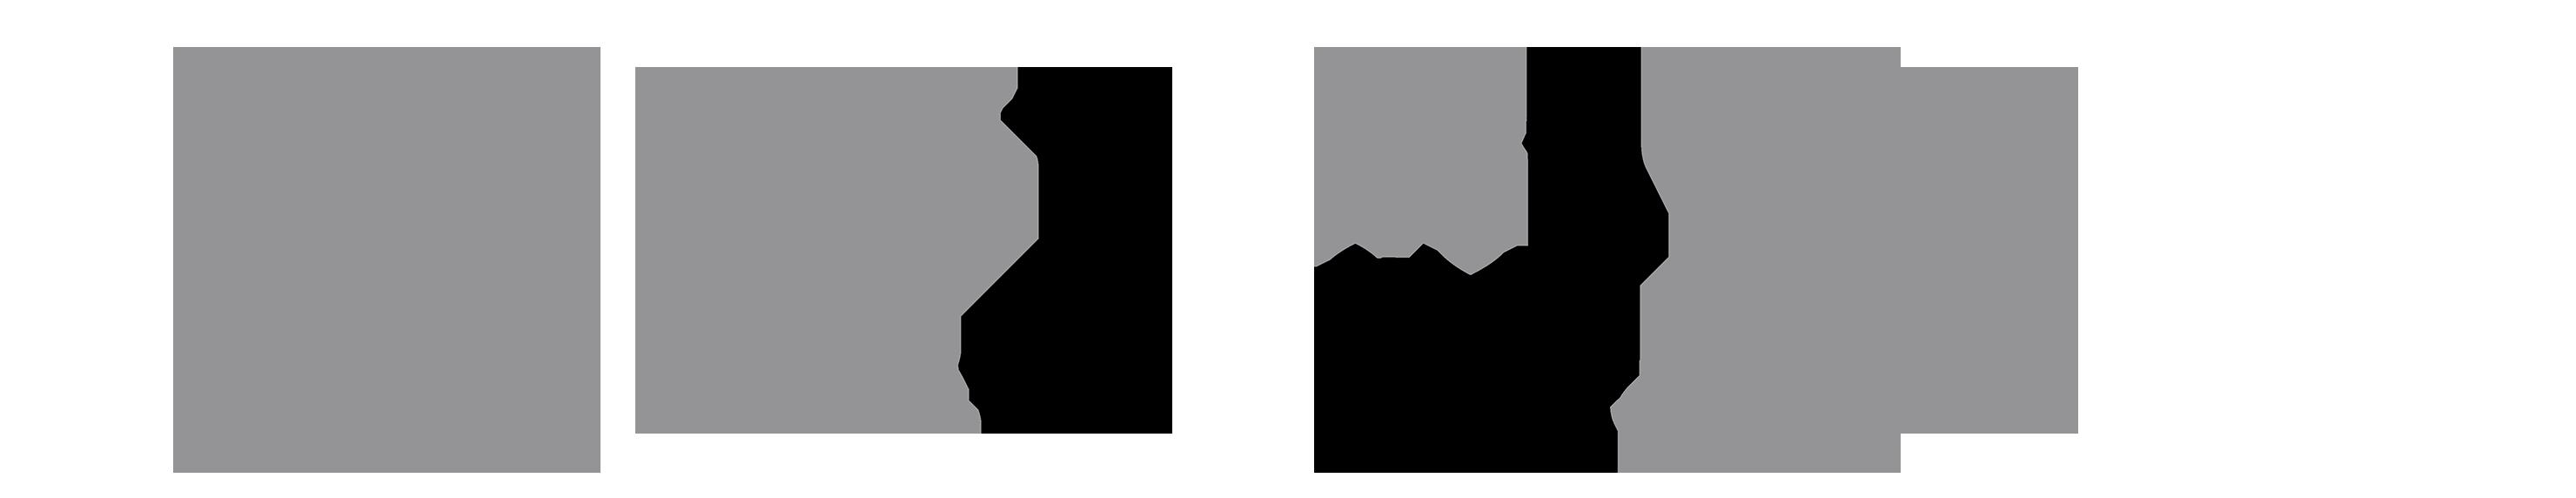 Typeface-Heimat-Mono-F04-Atlas-Font-Foundry